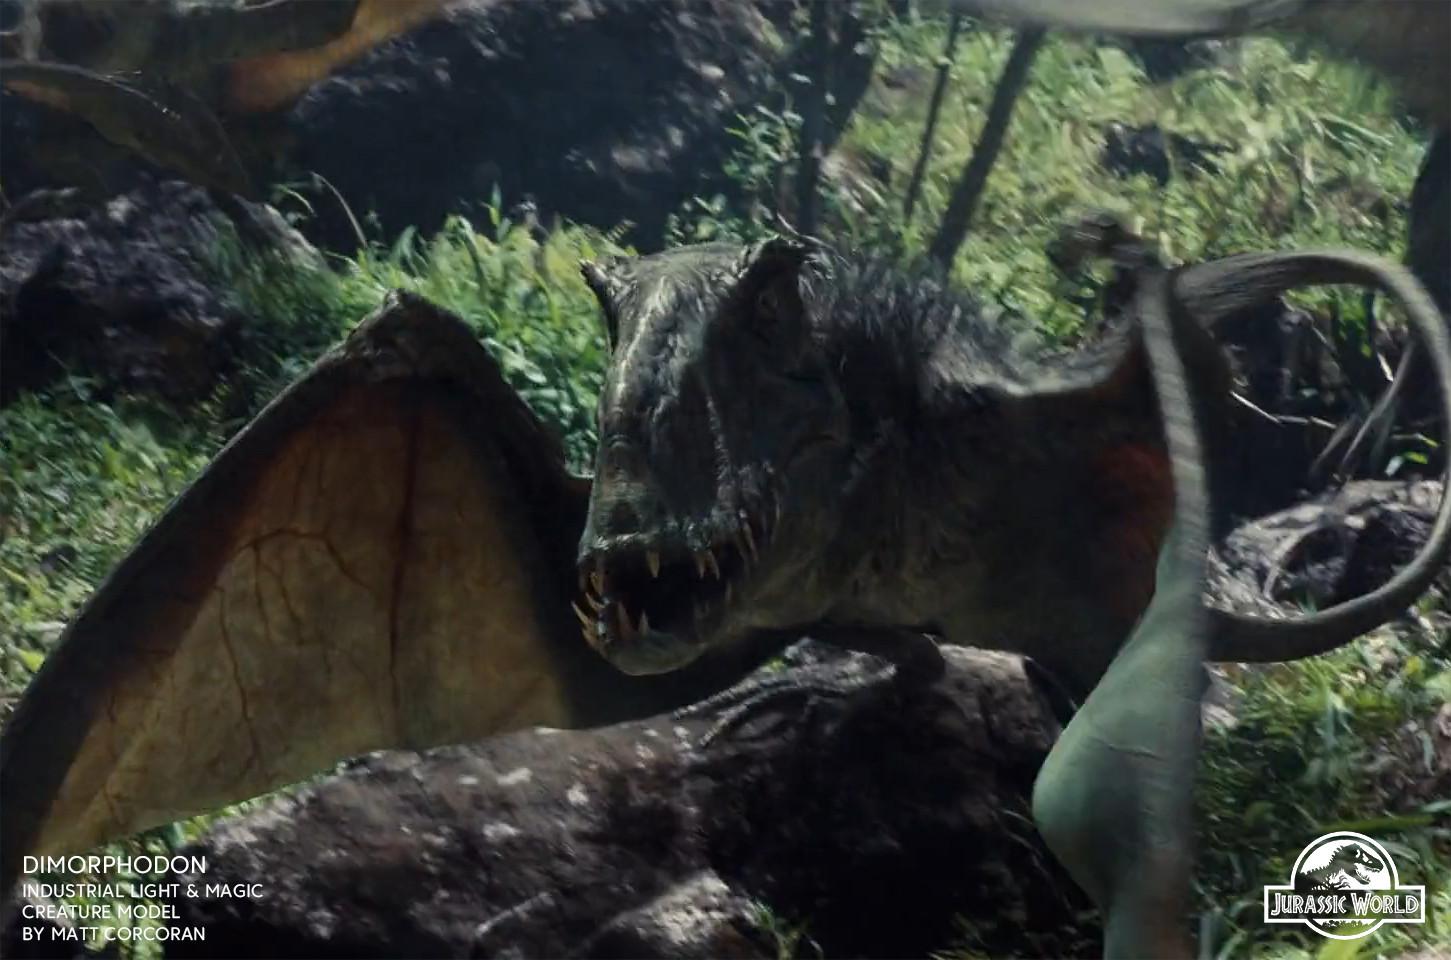 Matt corcoran jurassicworld dimorphodon 02